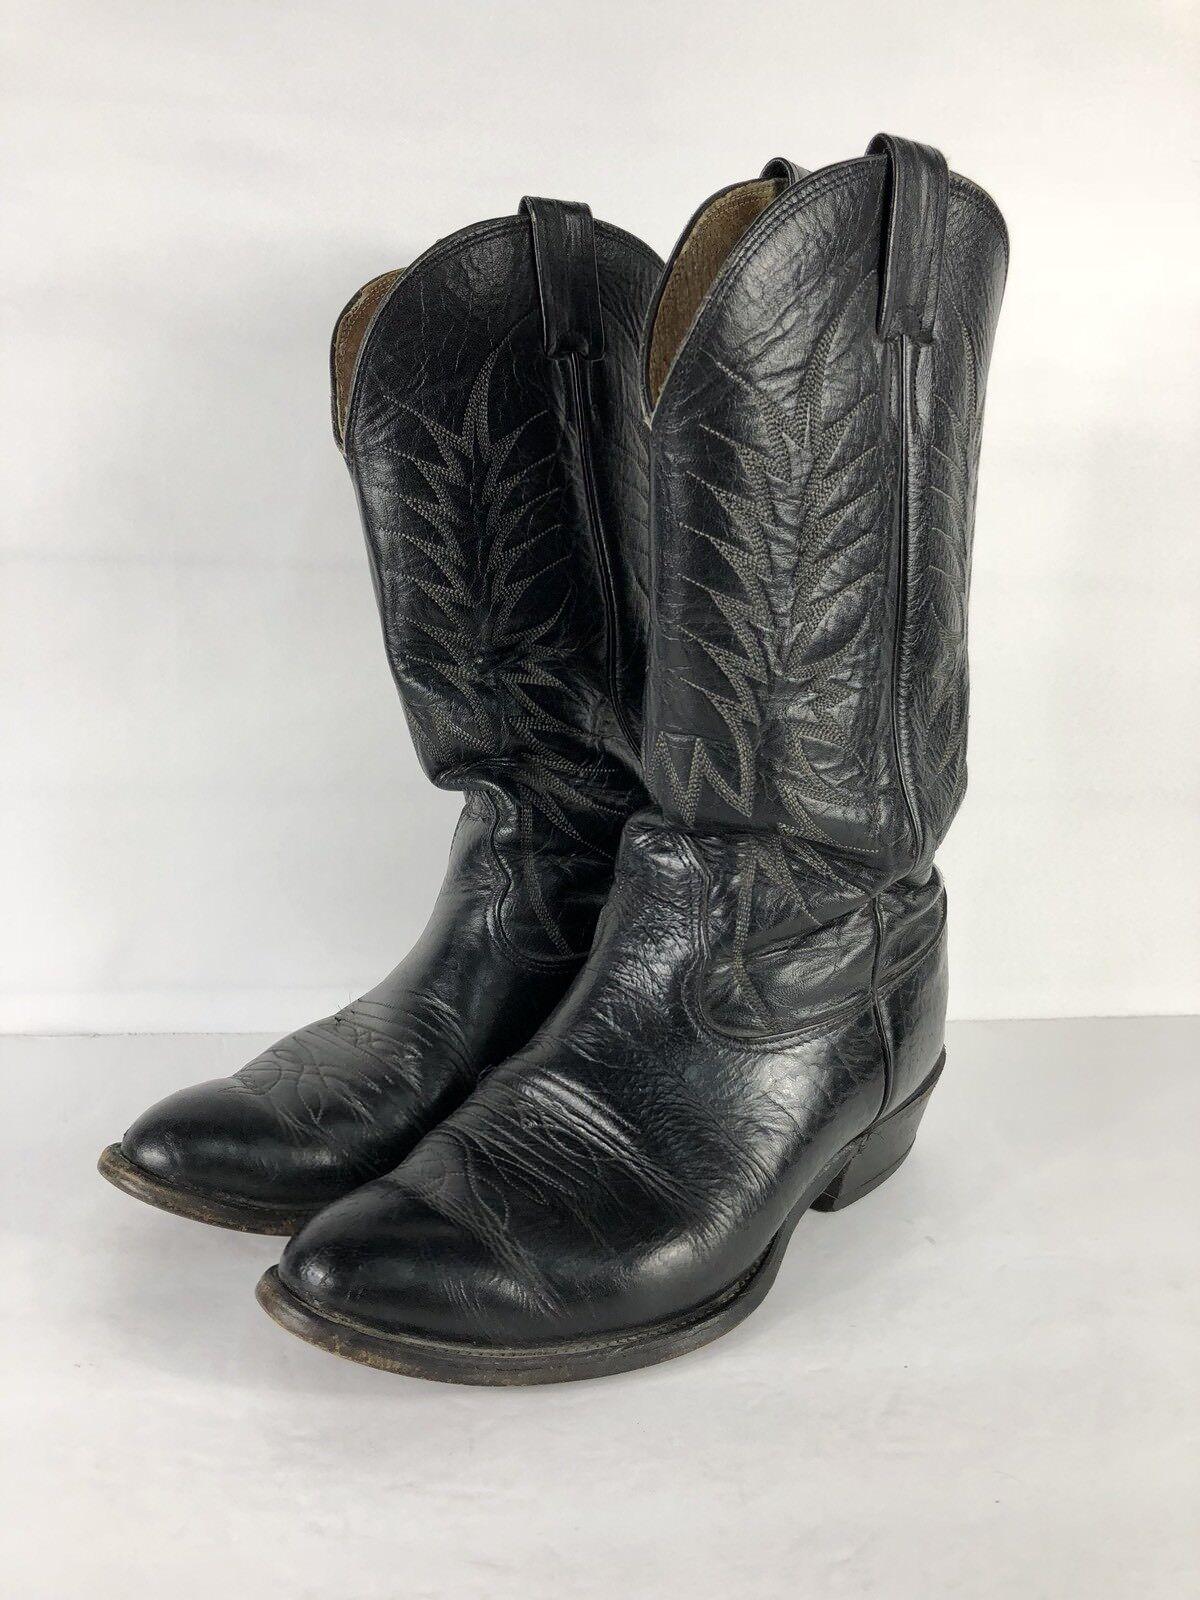 NOCONA BOOTS Men's Gray & Black Classic Size Leather Western Cowboy Boots Size Classic 7.5 2E 15d91d